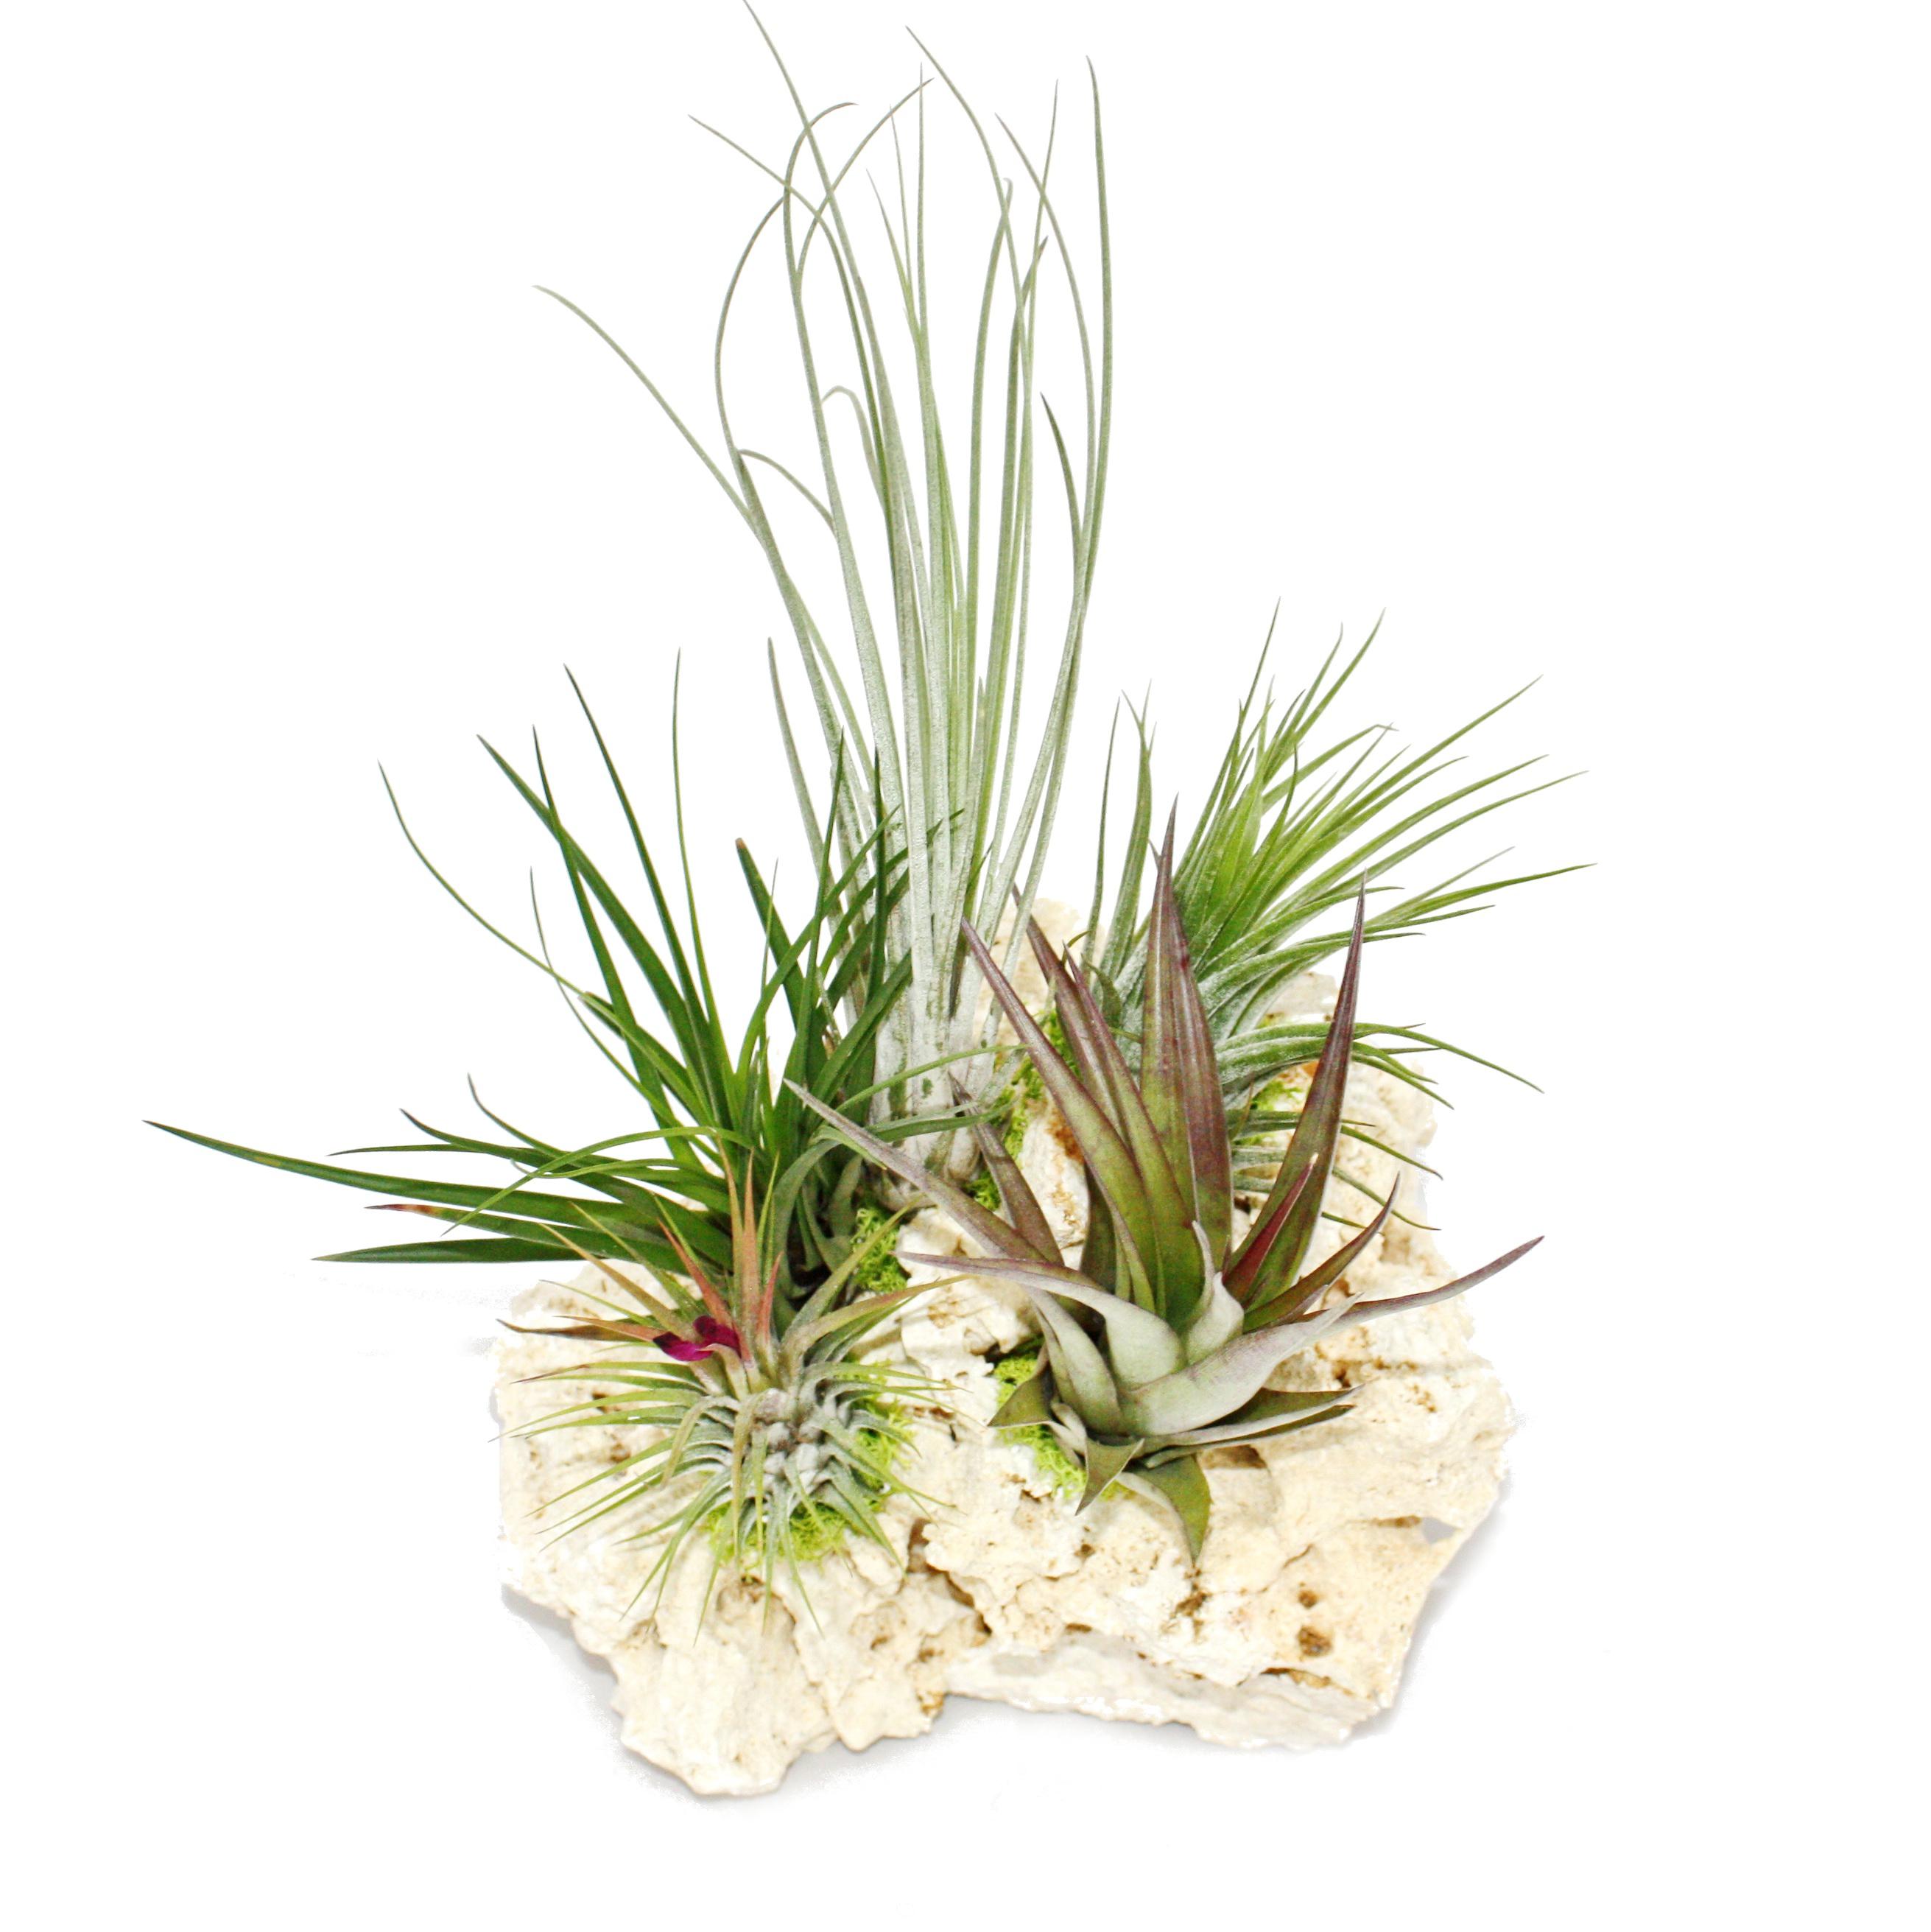 Tillandsien Kaufen tillandsien auf sansibar rock 5 pflanzen ebay